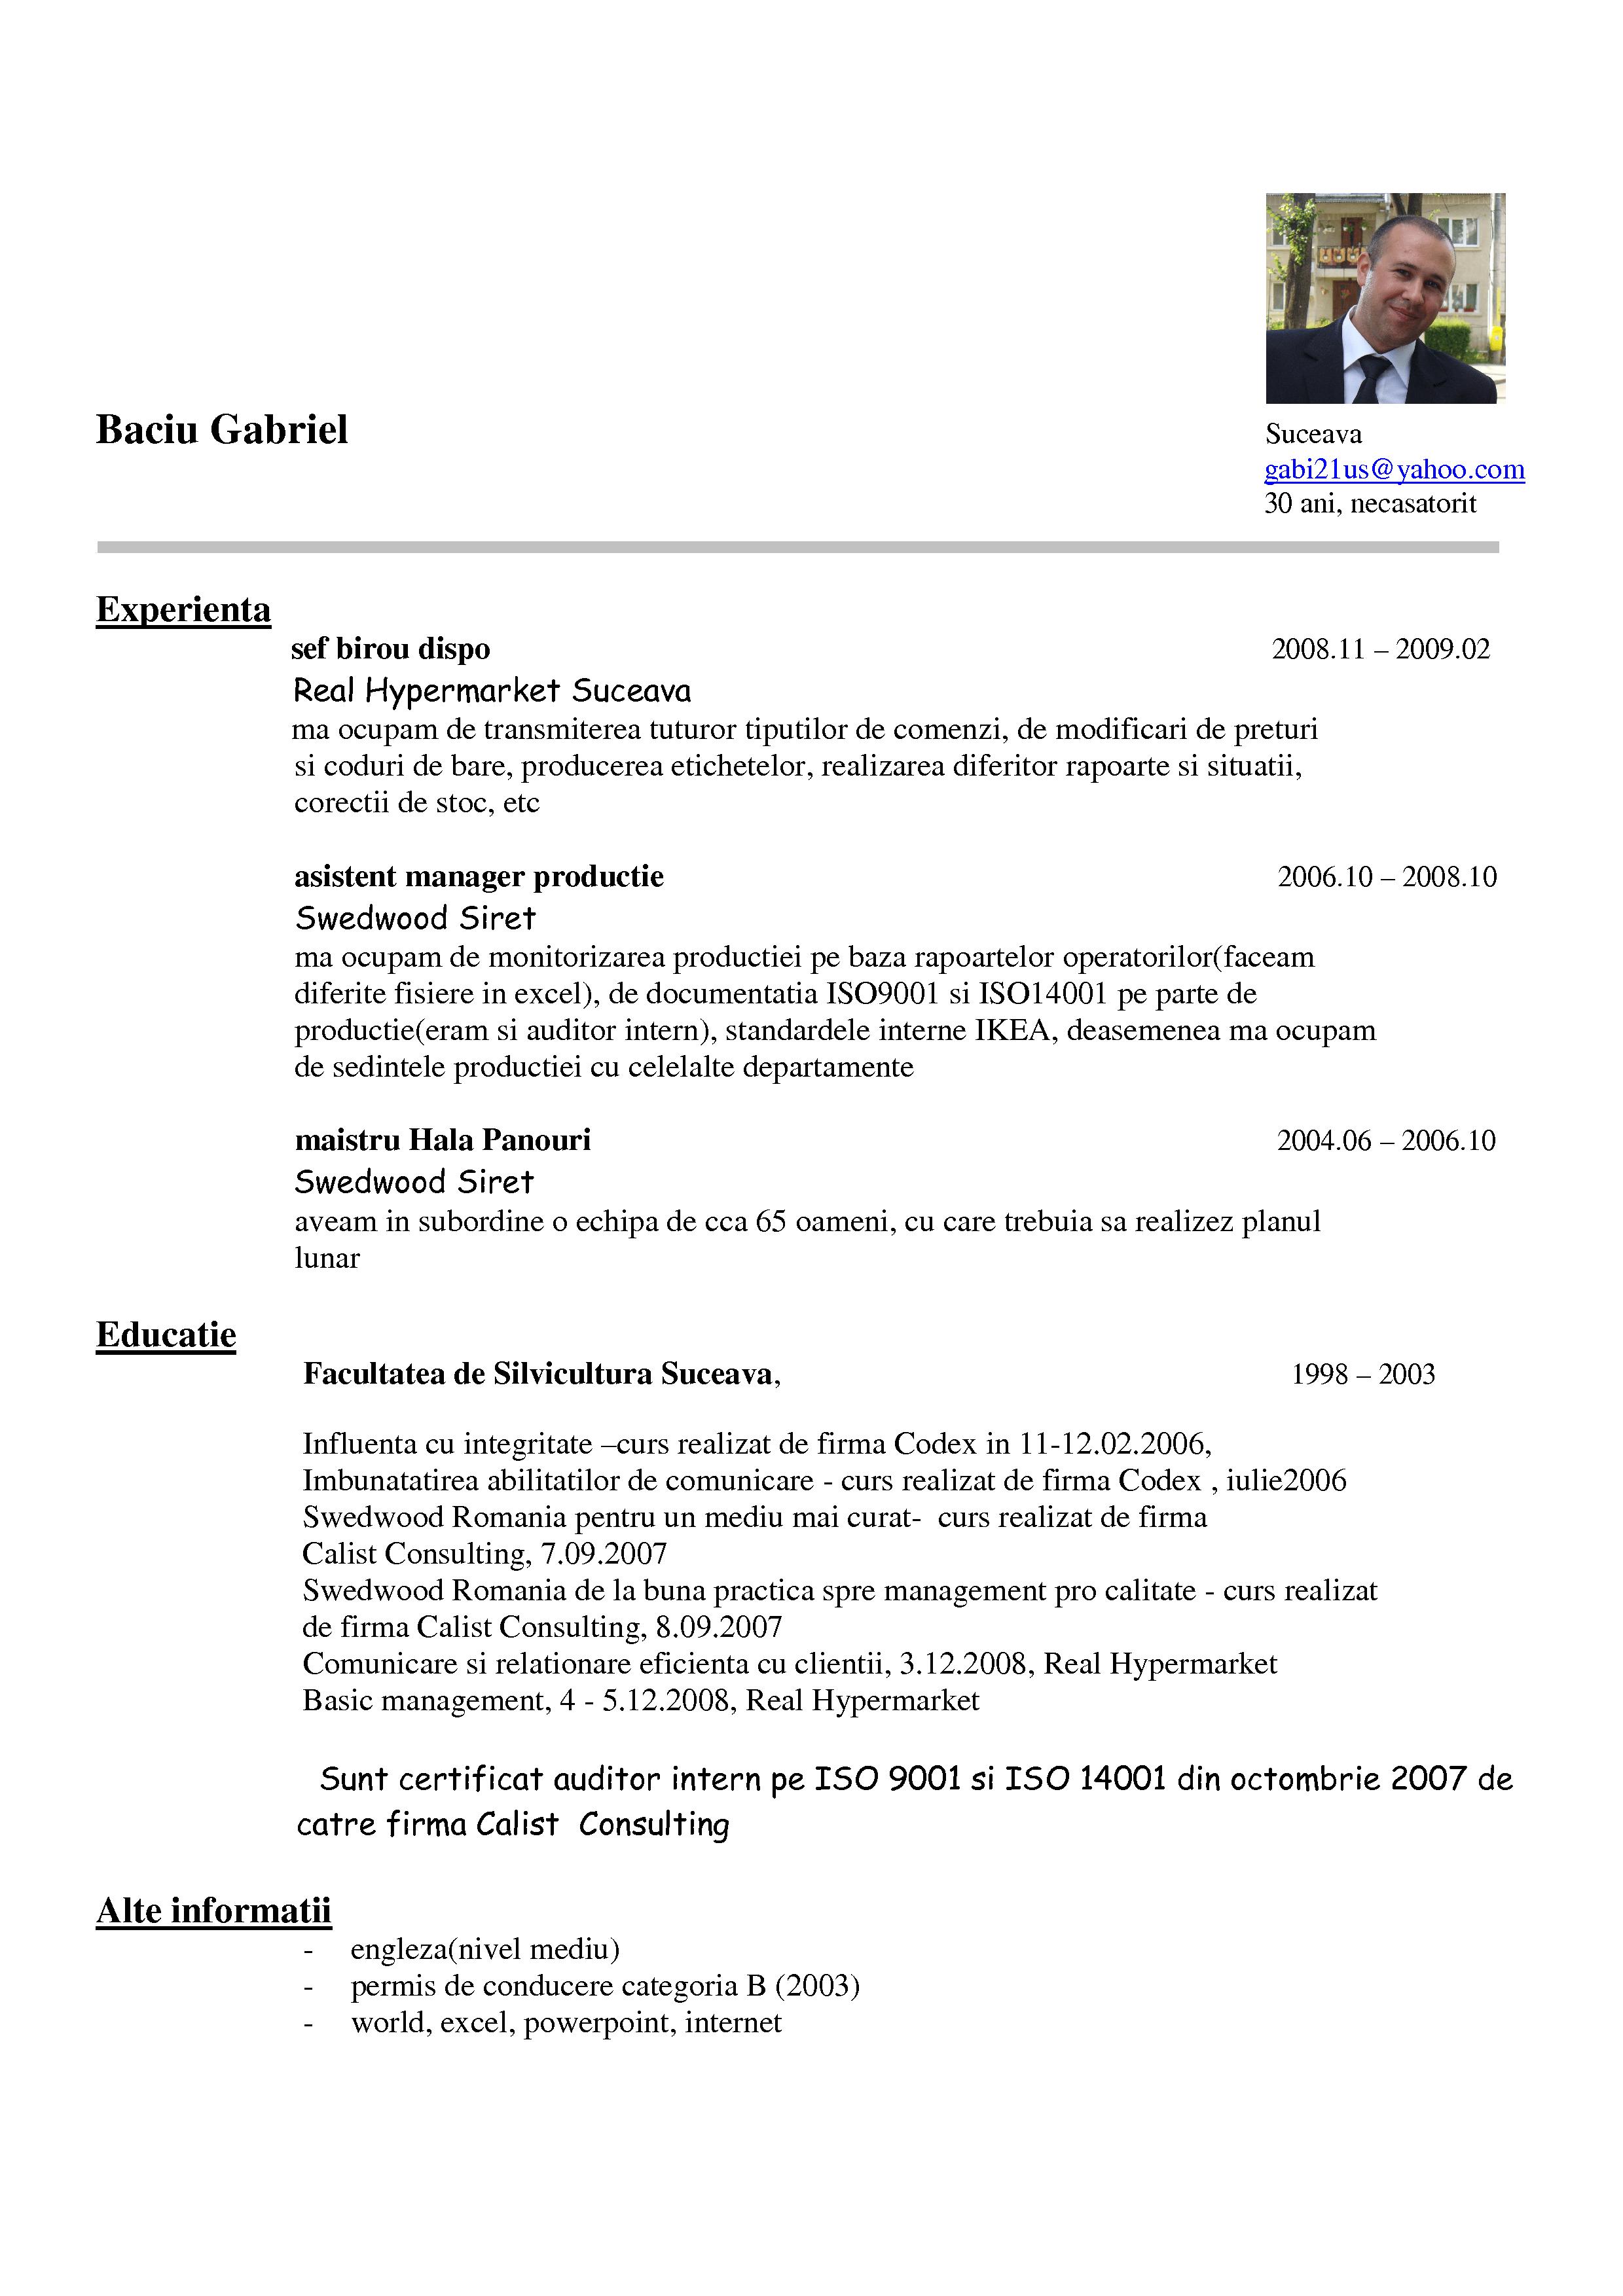 Good Summary For Linkedin Profile